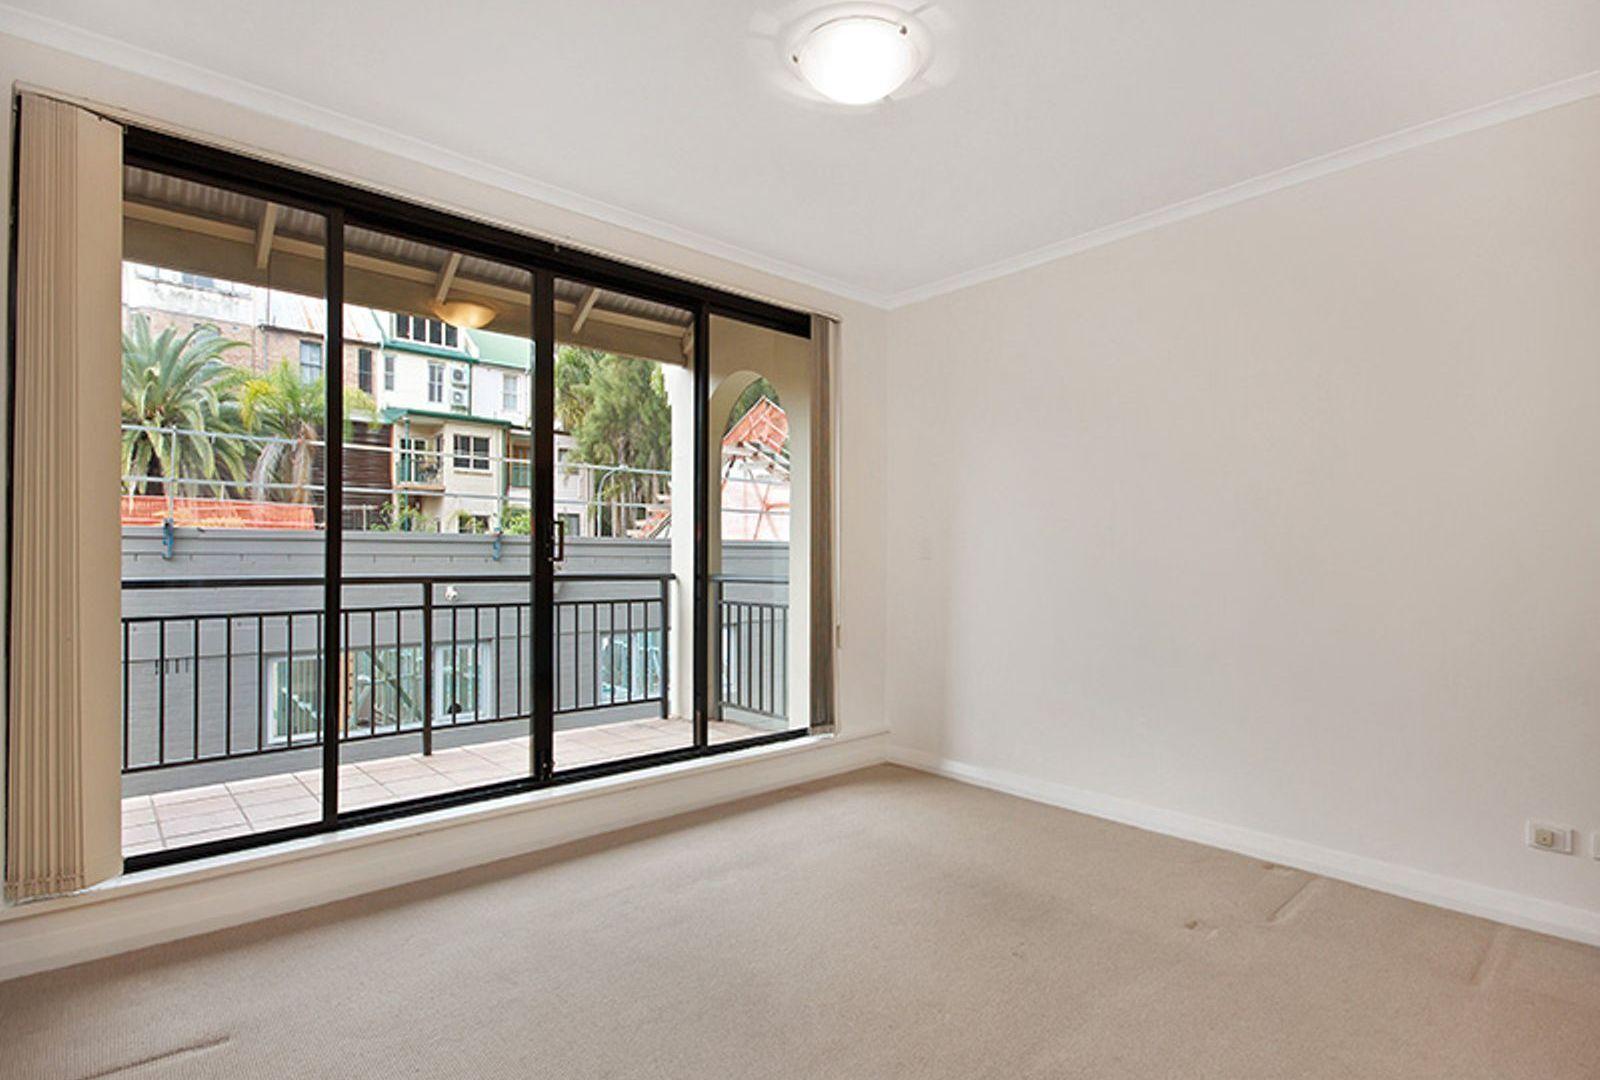 25/175 Cathedral Street, Woolloomooloo NSW 2011, Image 2